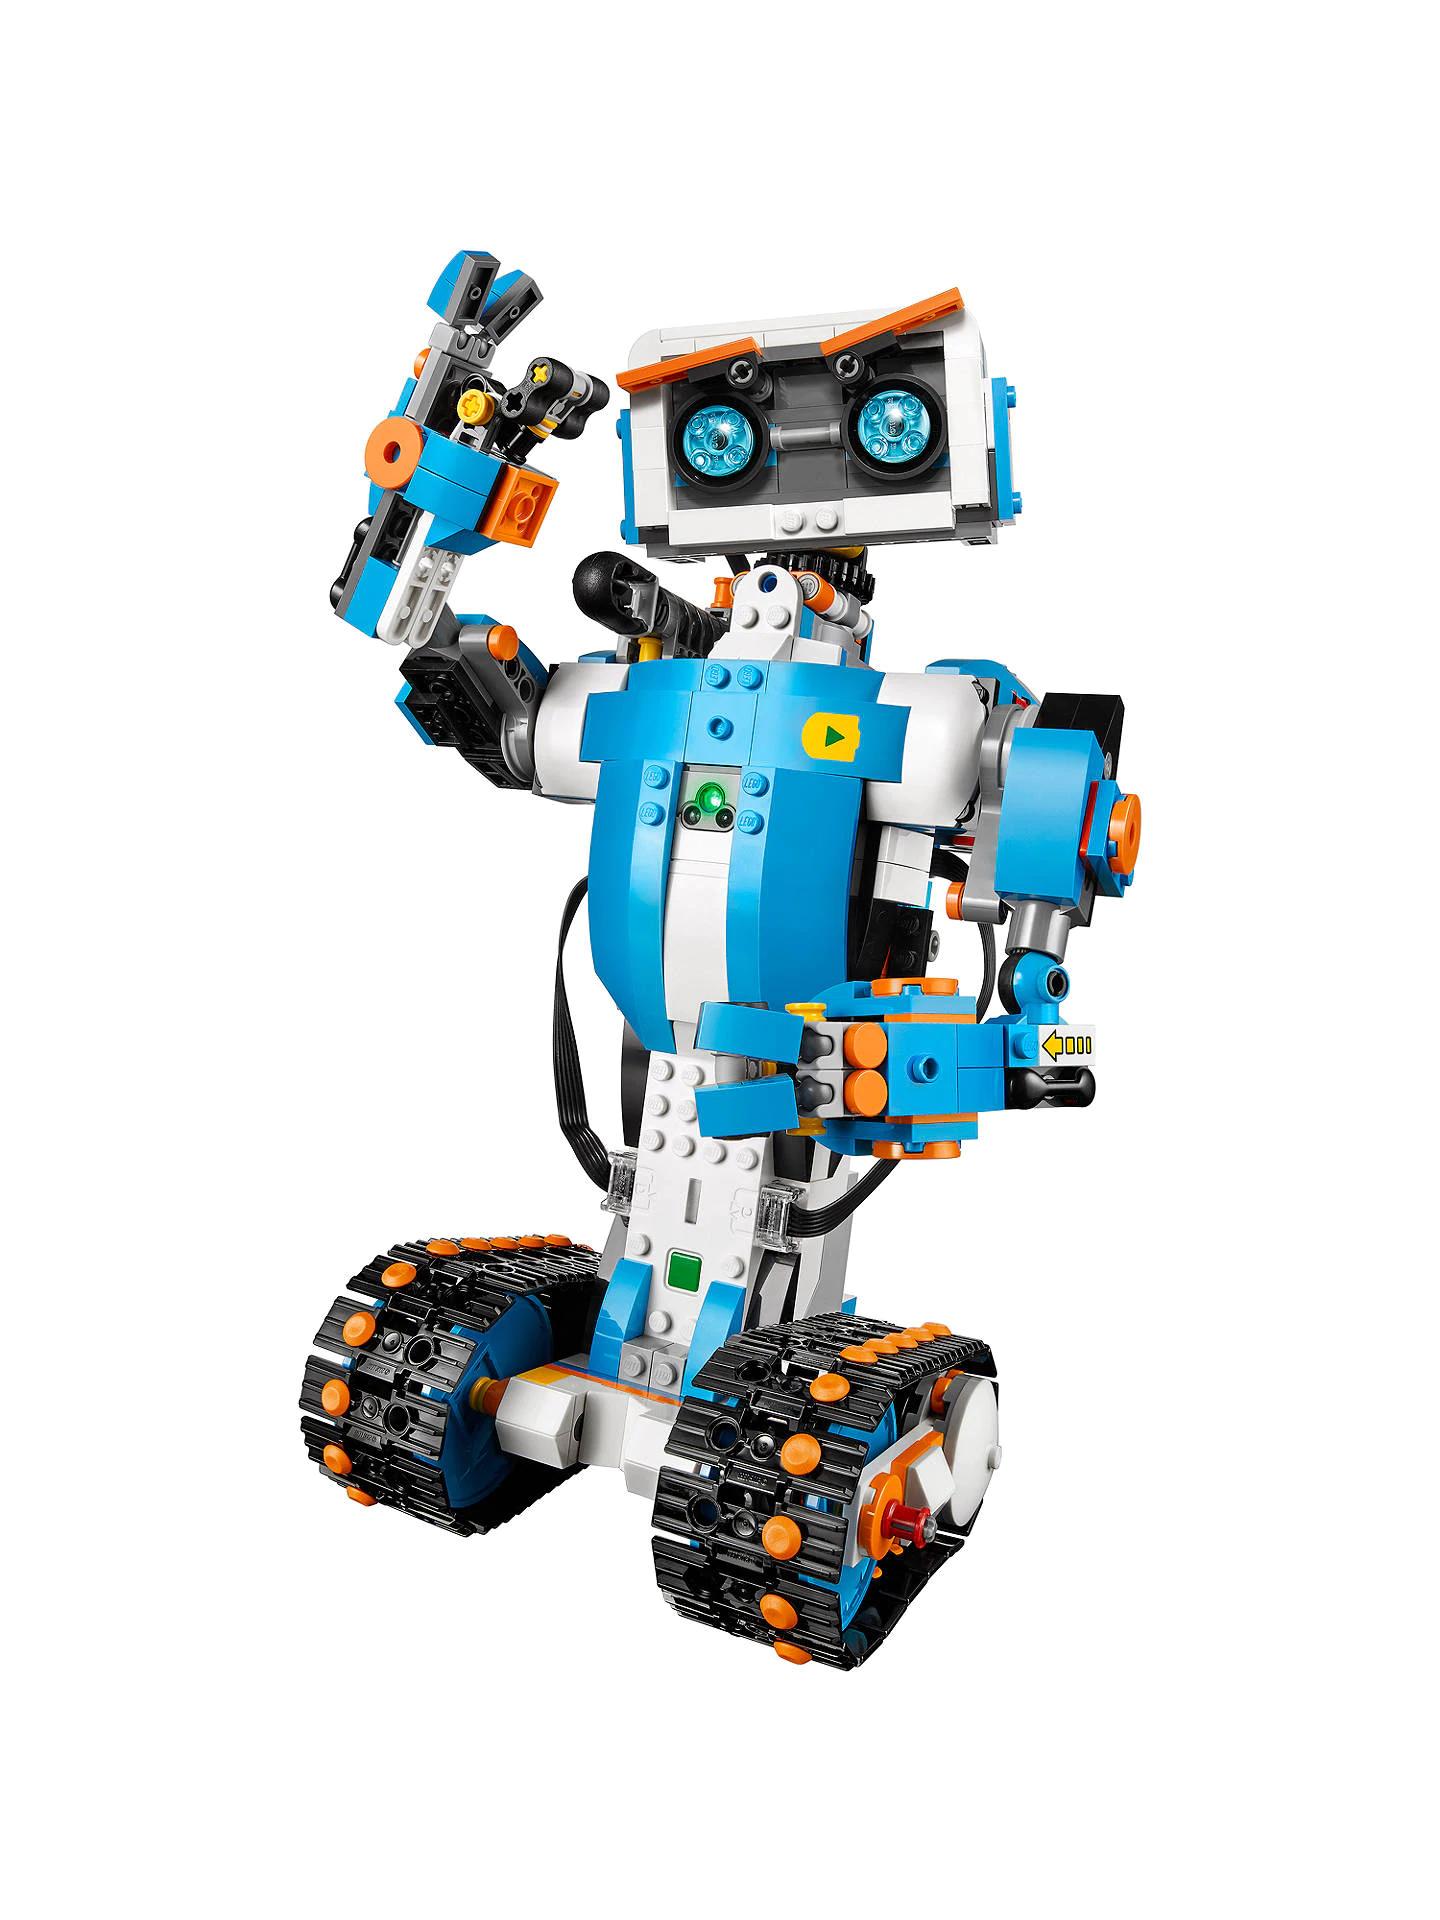 LEGO Boost 17101 Creative Toolbox £94.99 @ John Lewis & Partners